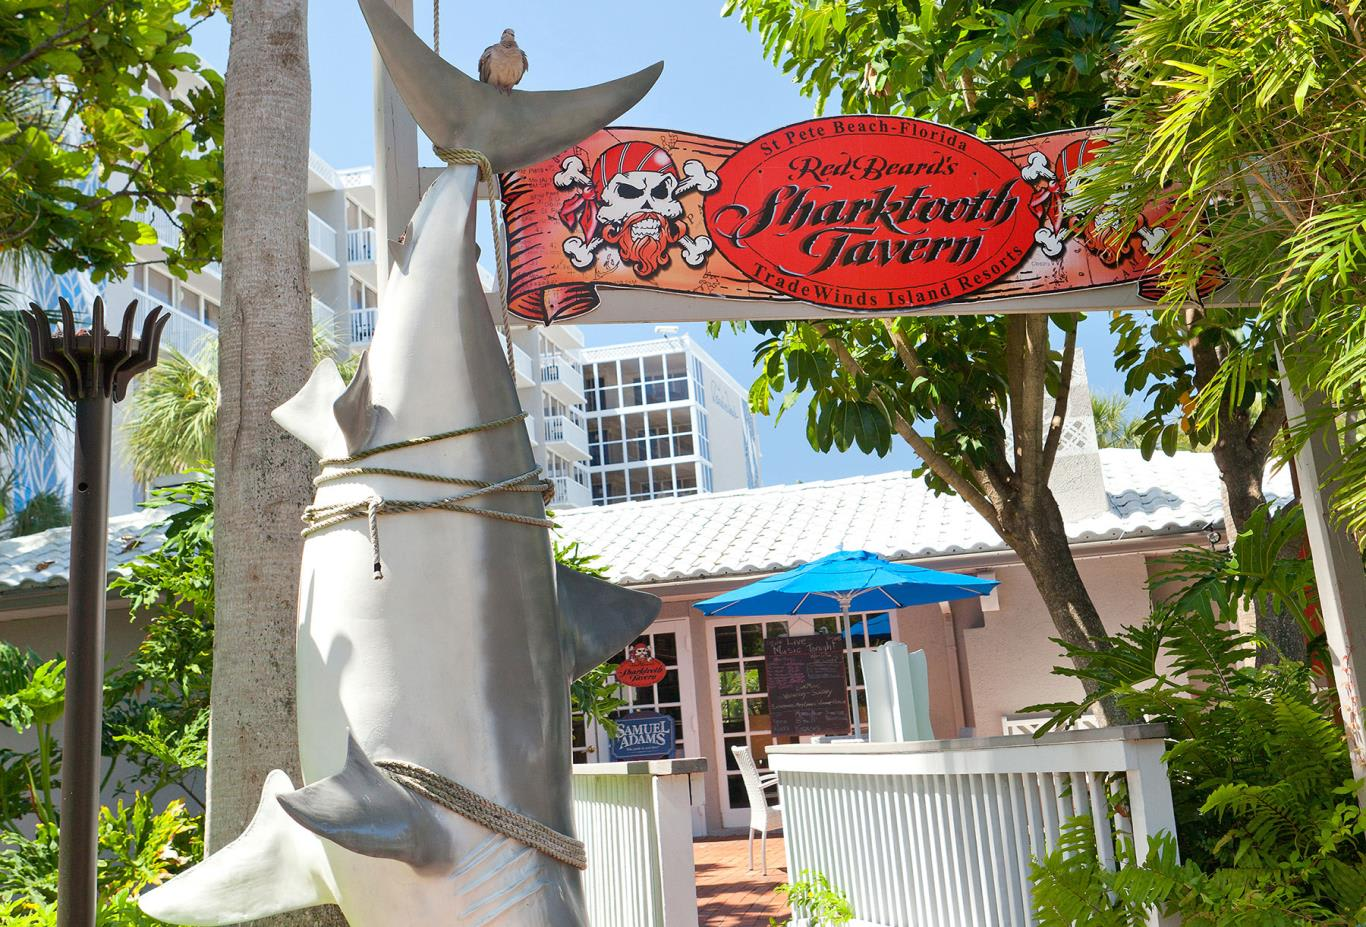 Sharktooth Tavern